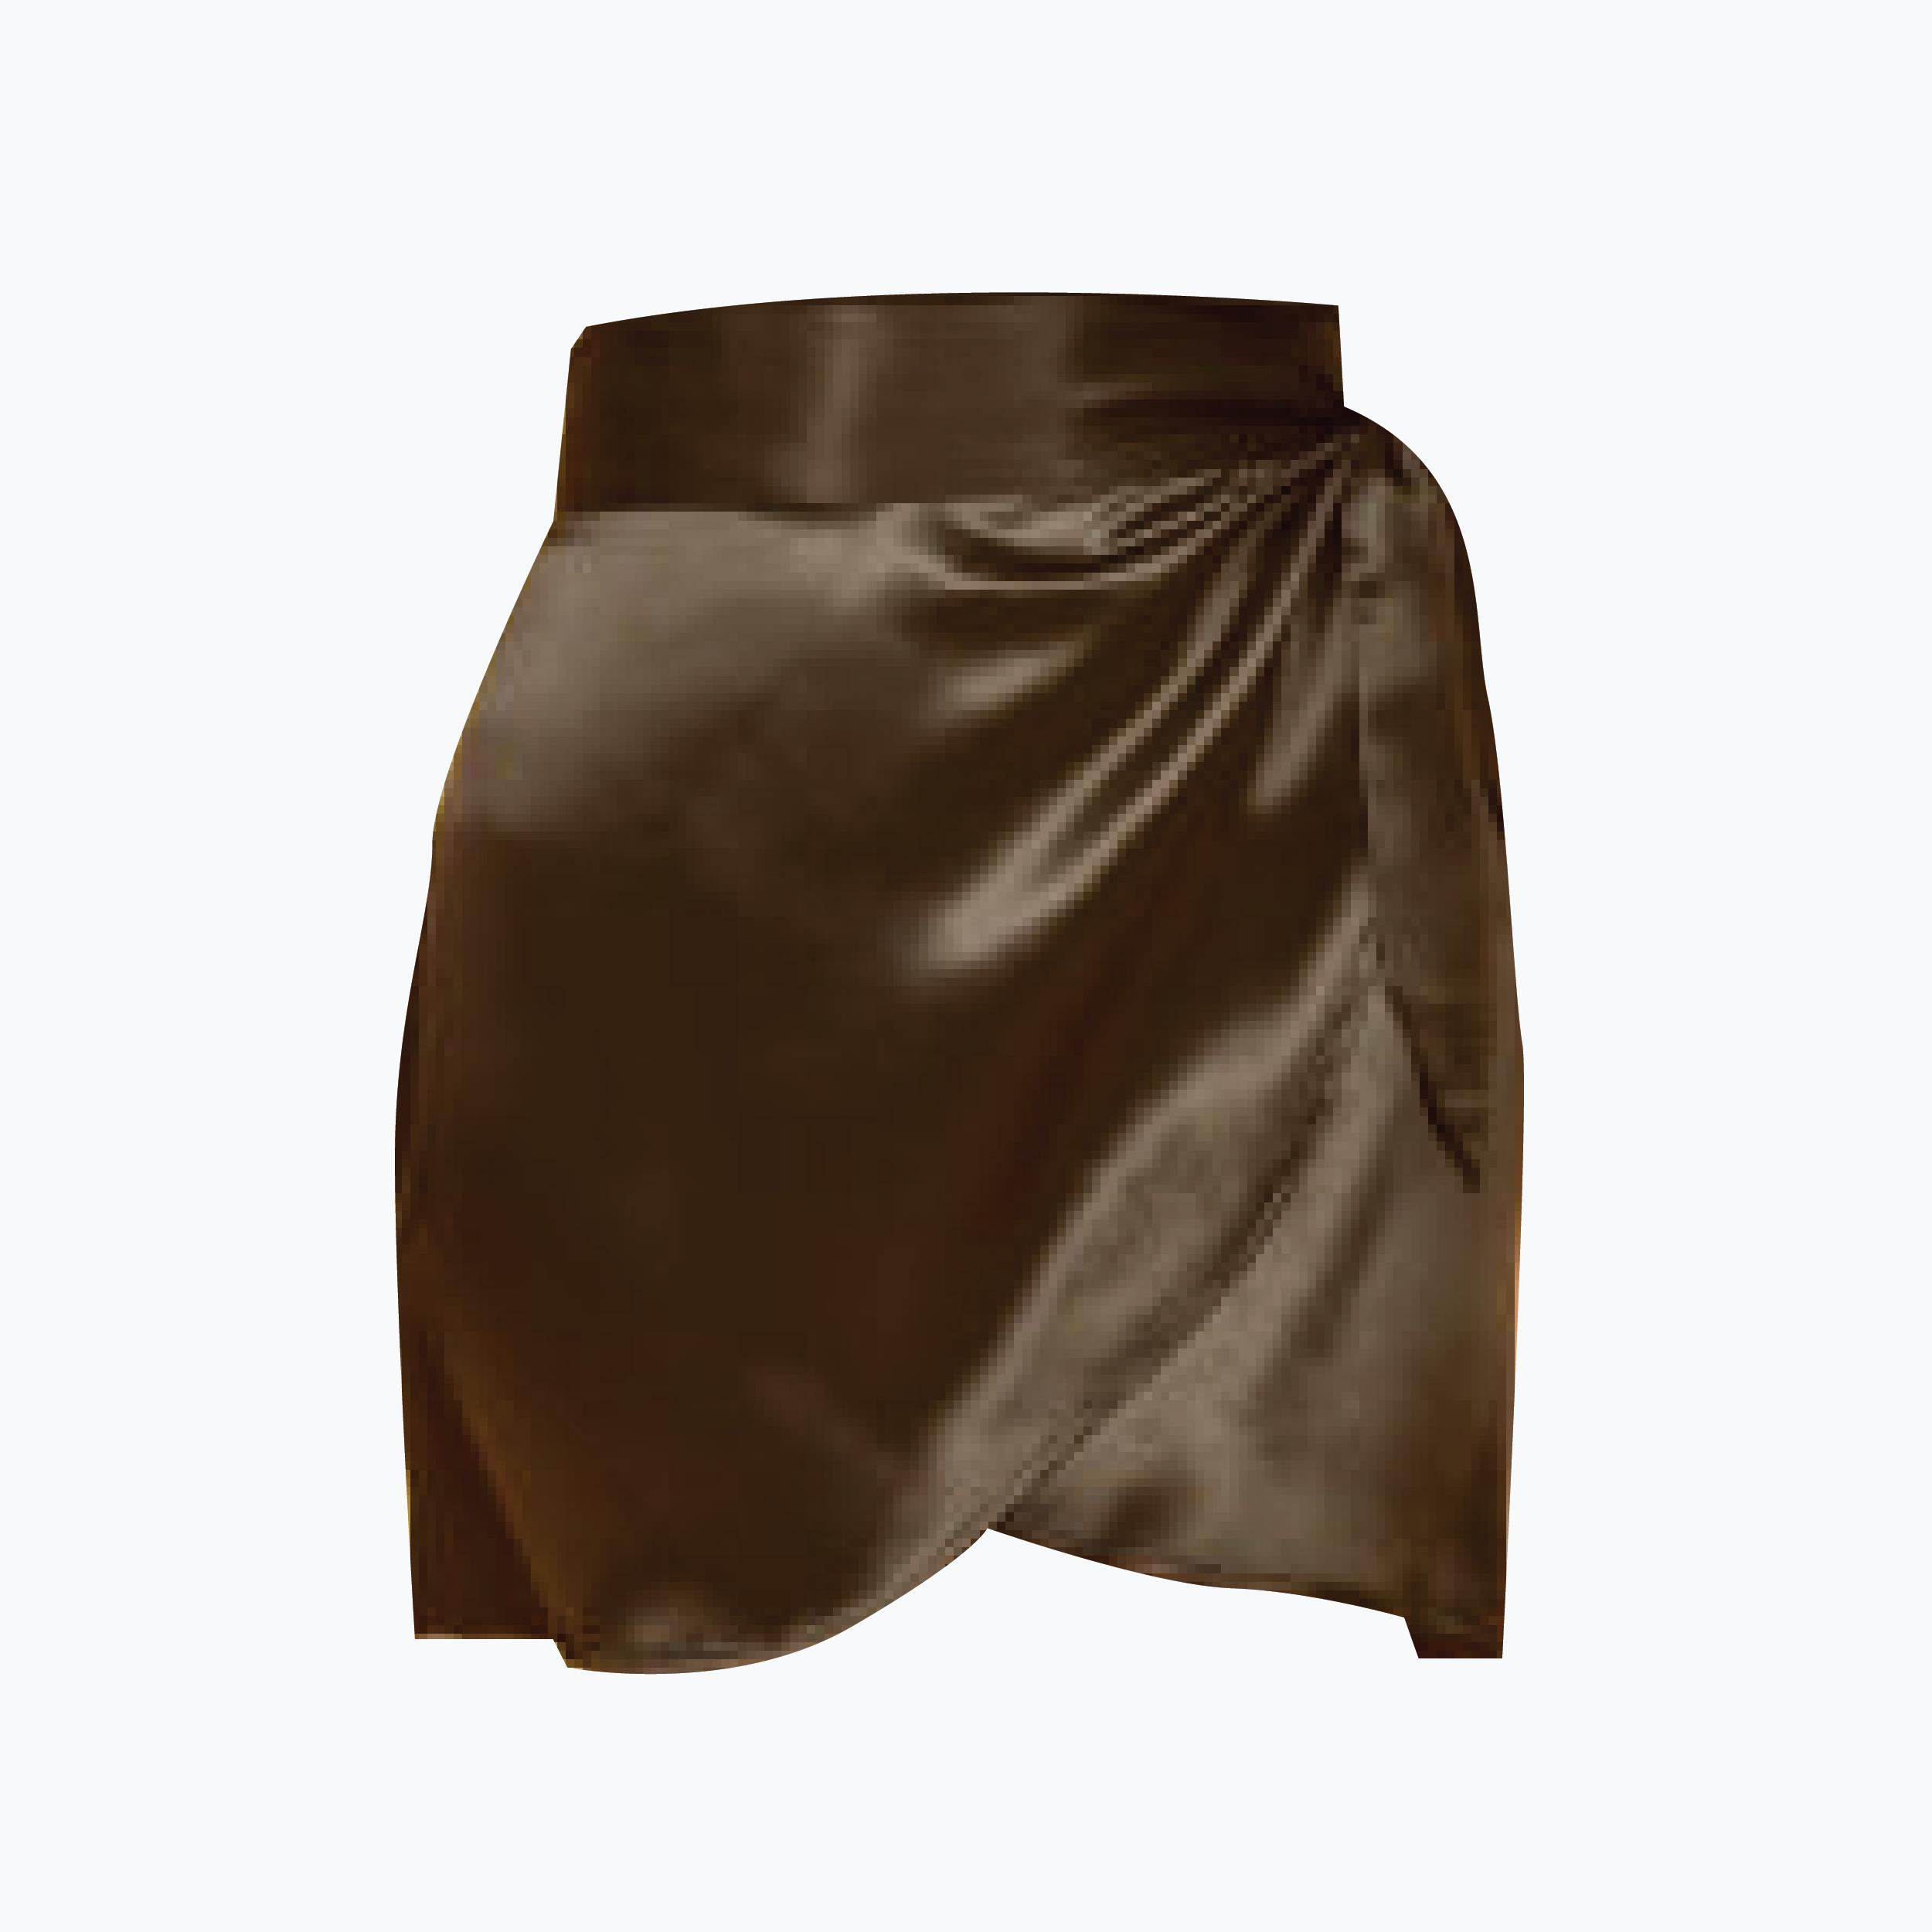 Reformation Jilly Skirt, $201